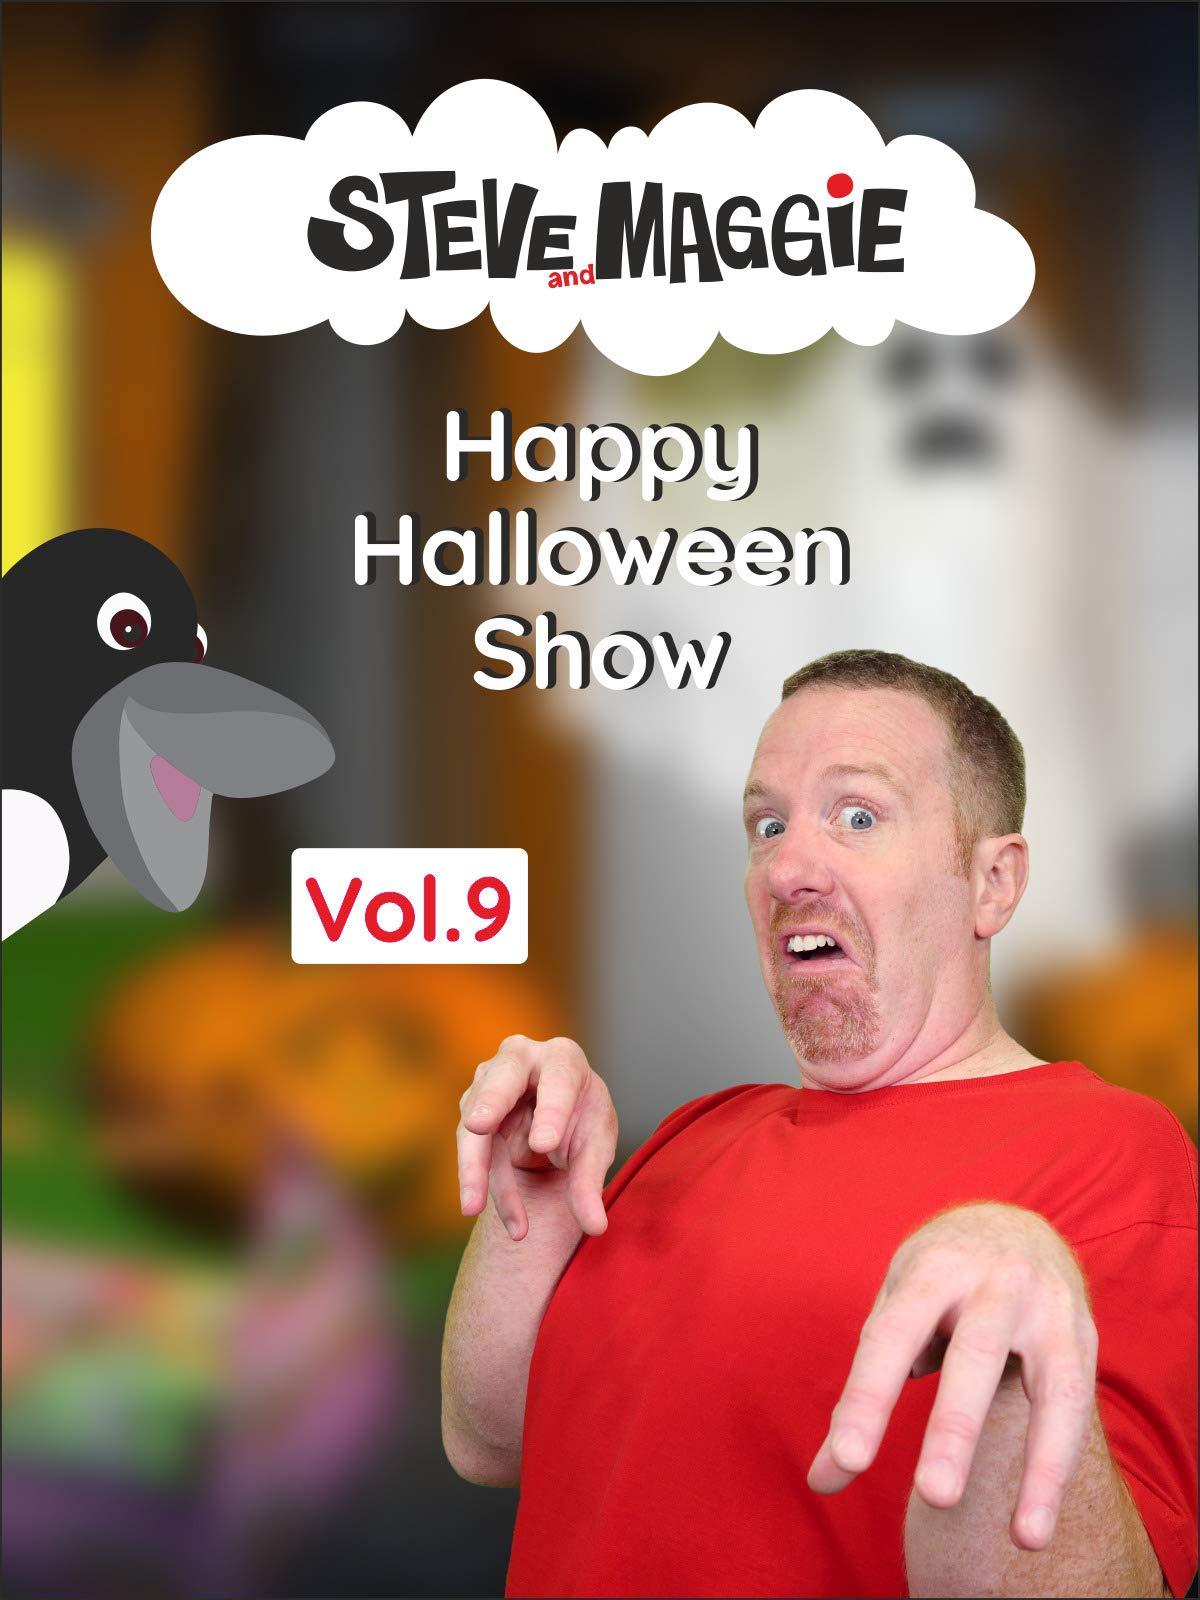 Steve and Maggie - Happy Halloween Show (Vol. 9) on Amazon Prime Video UK